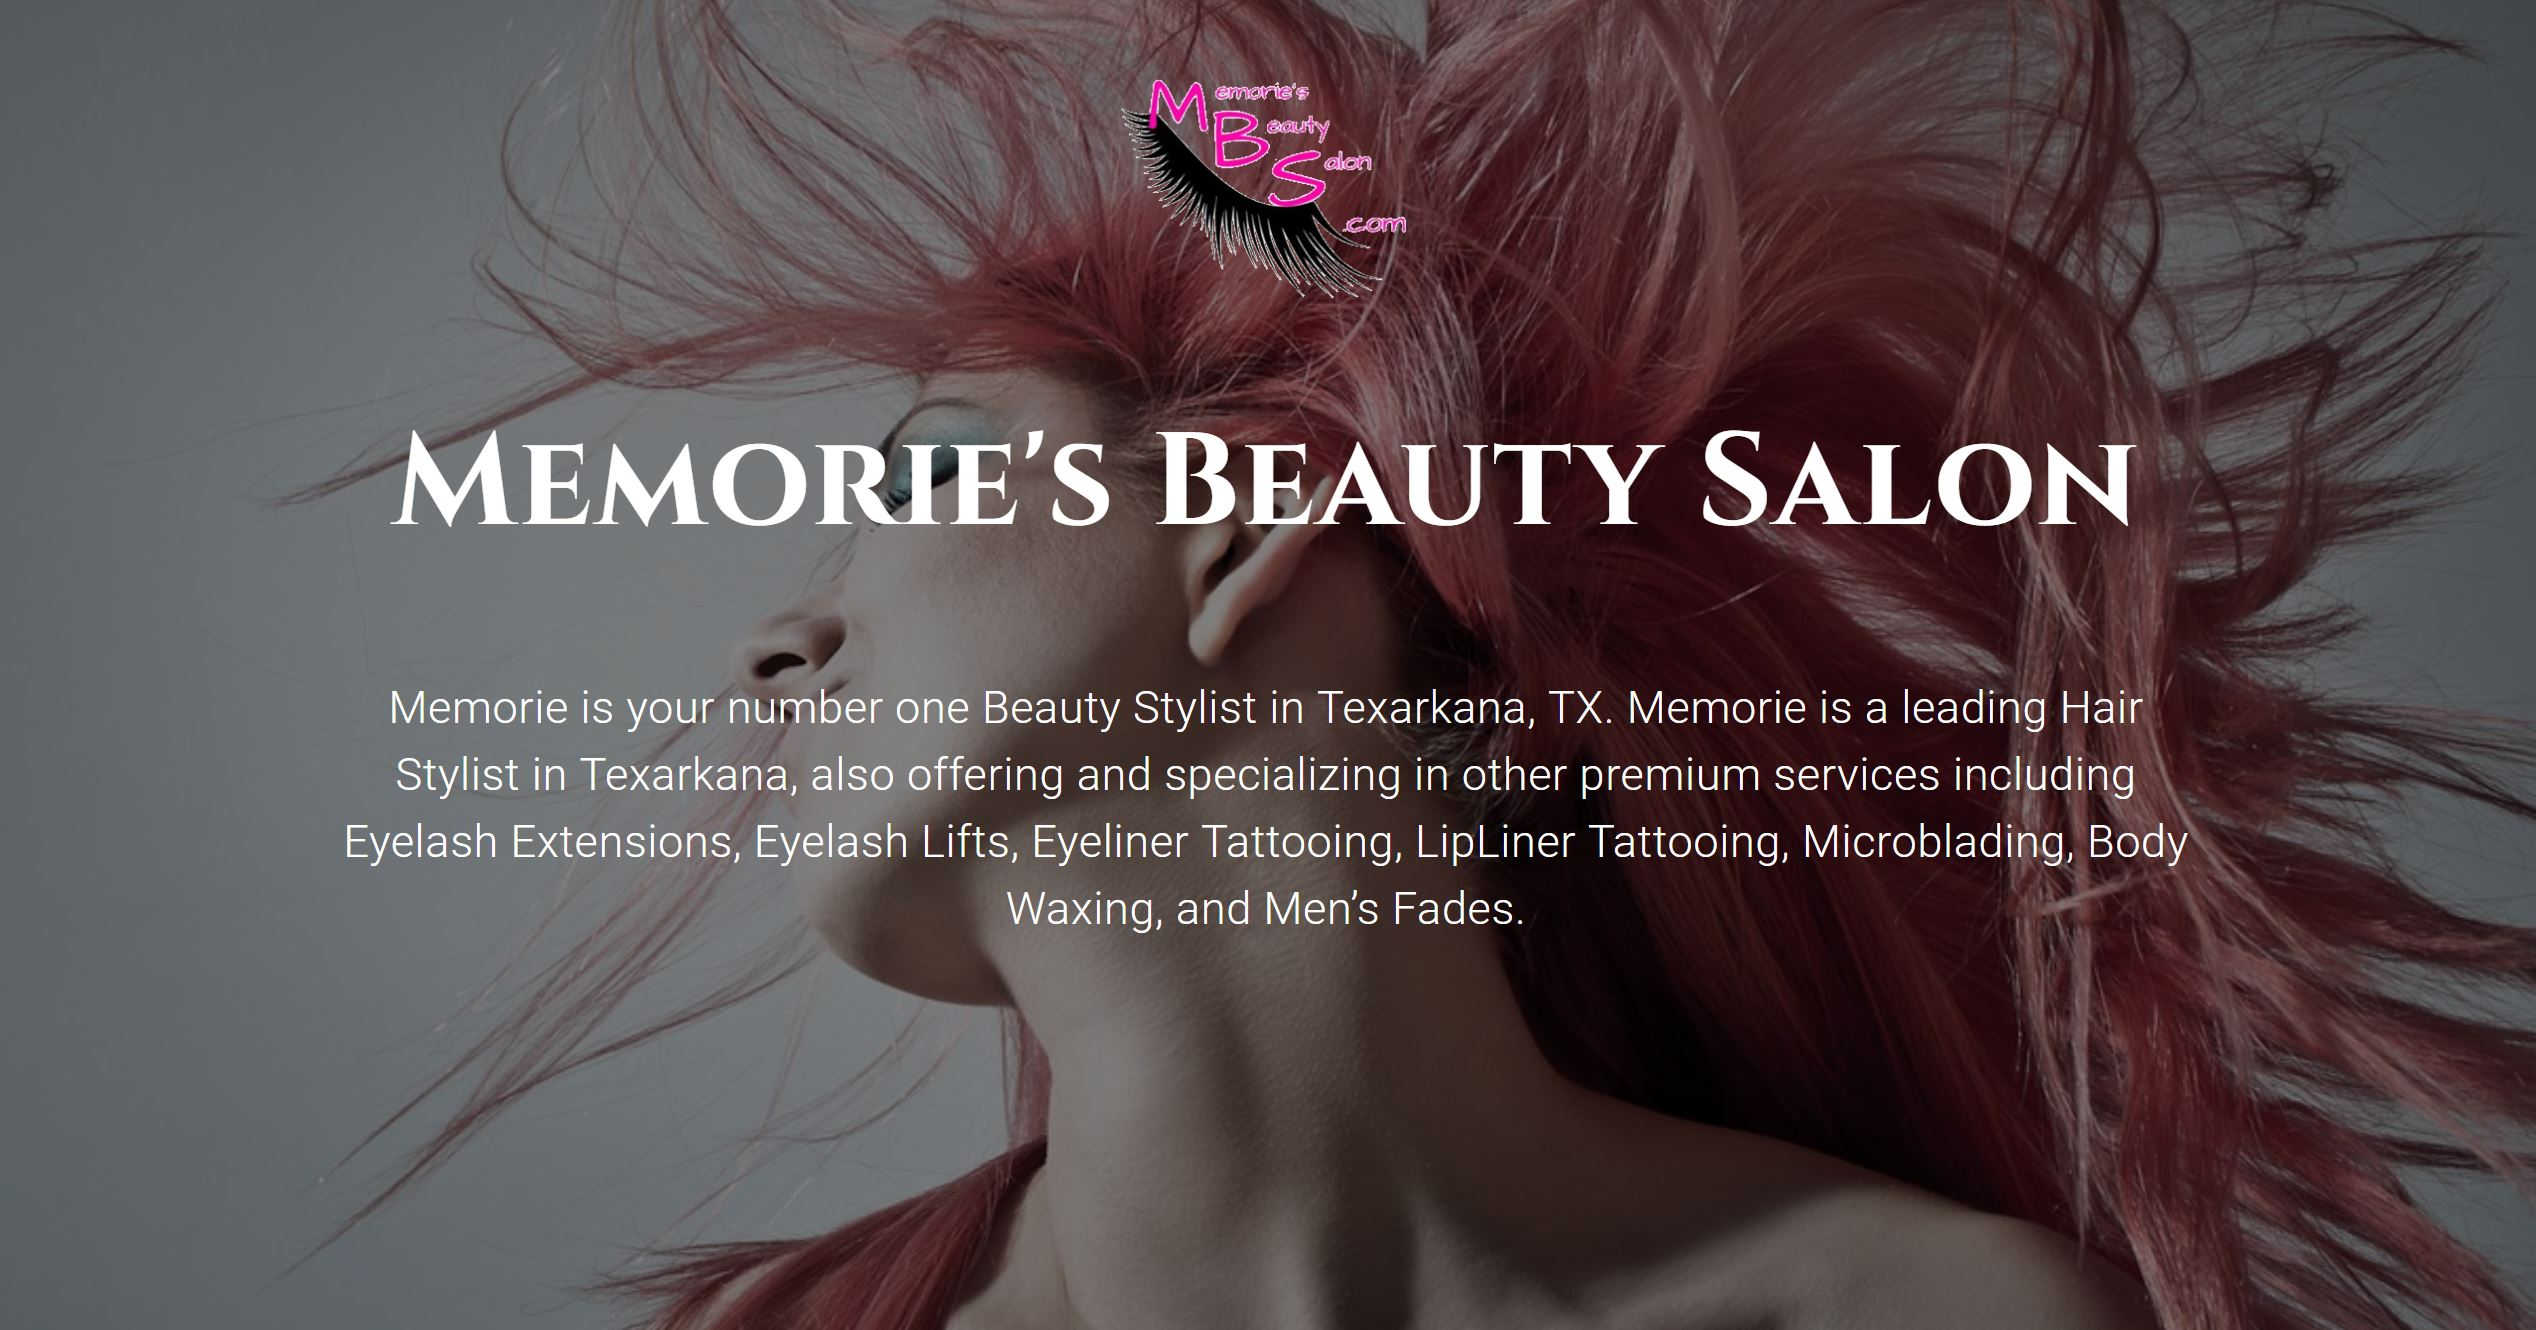 Memorie S Beauty Salon 6500 Summerhill Rd Texarkana Tx 75503 Yp Com